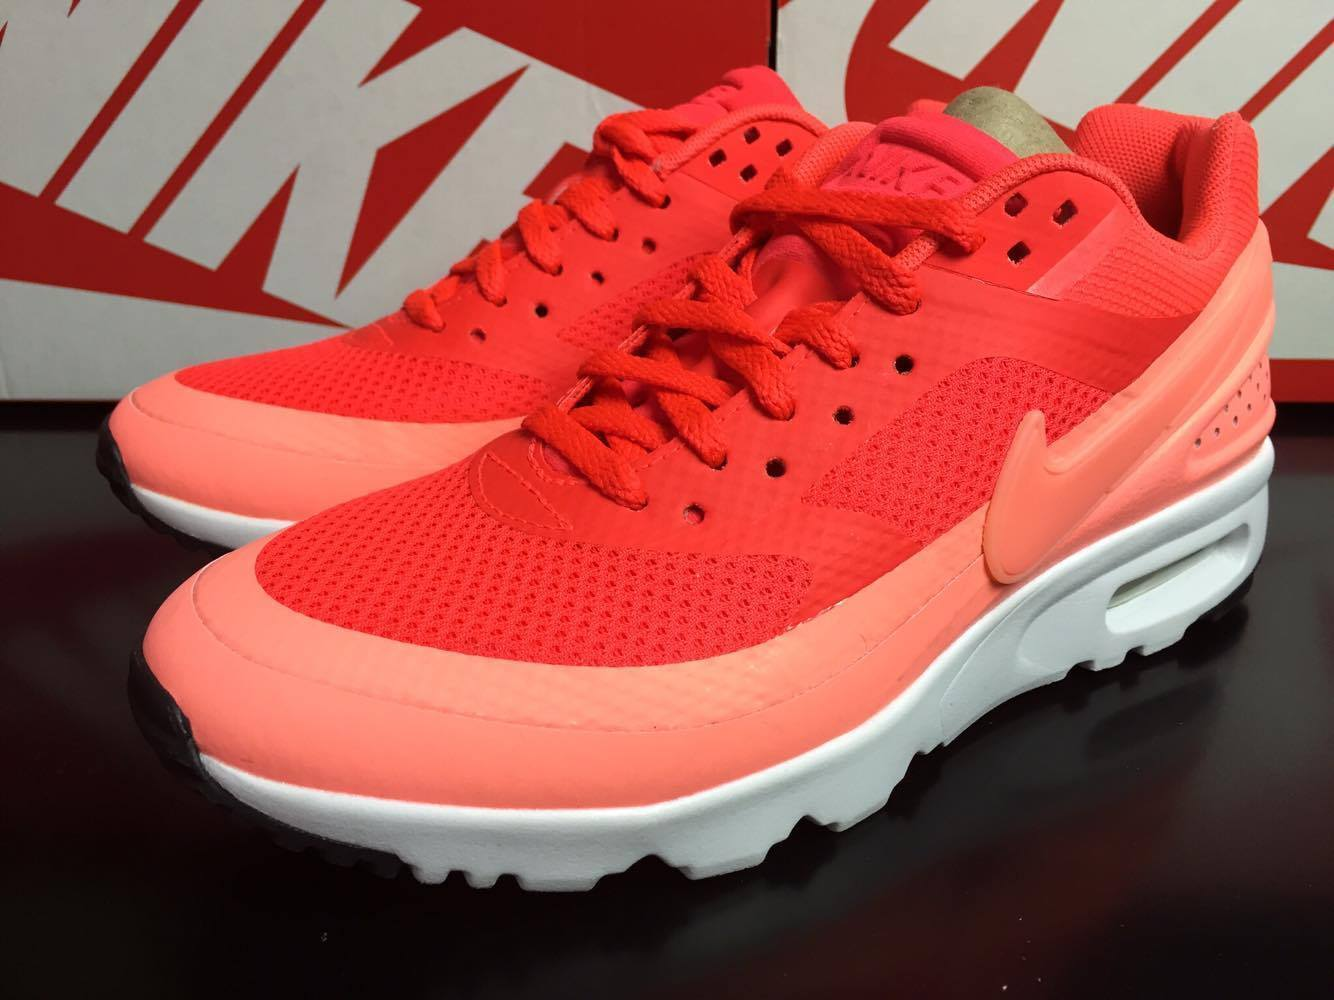 NIKE Femme Air Max BW Ultra Running Chaussures Bright Crimson 819638 600